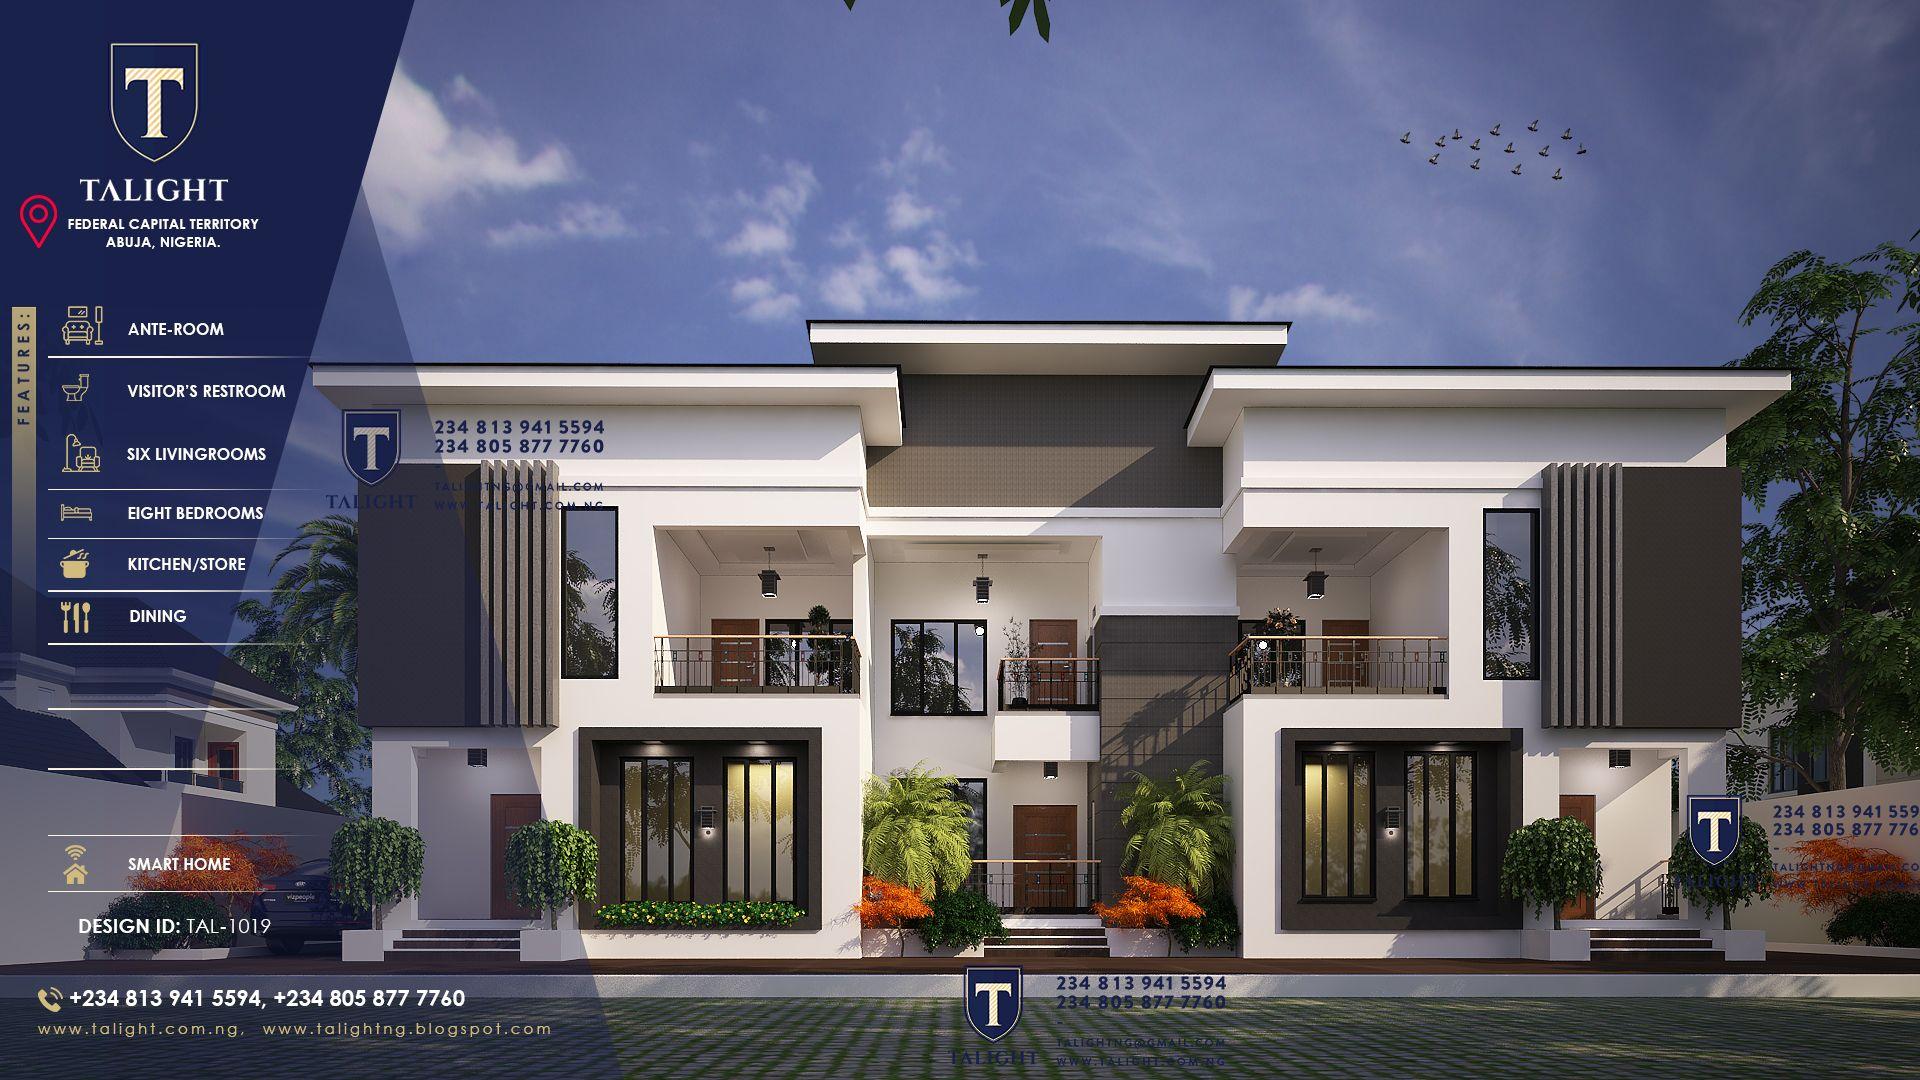 Architectural Design Of A Terrace Duplex Plan Modern Architecture Building Building House Plans Designs Architect Design House